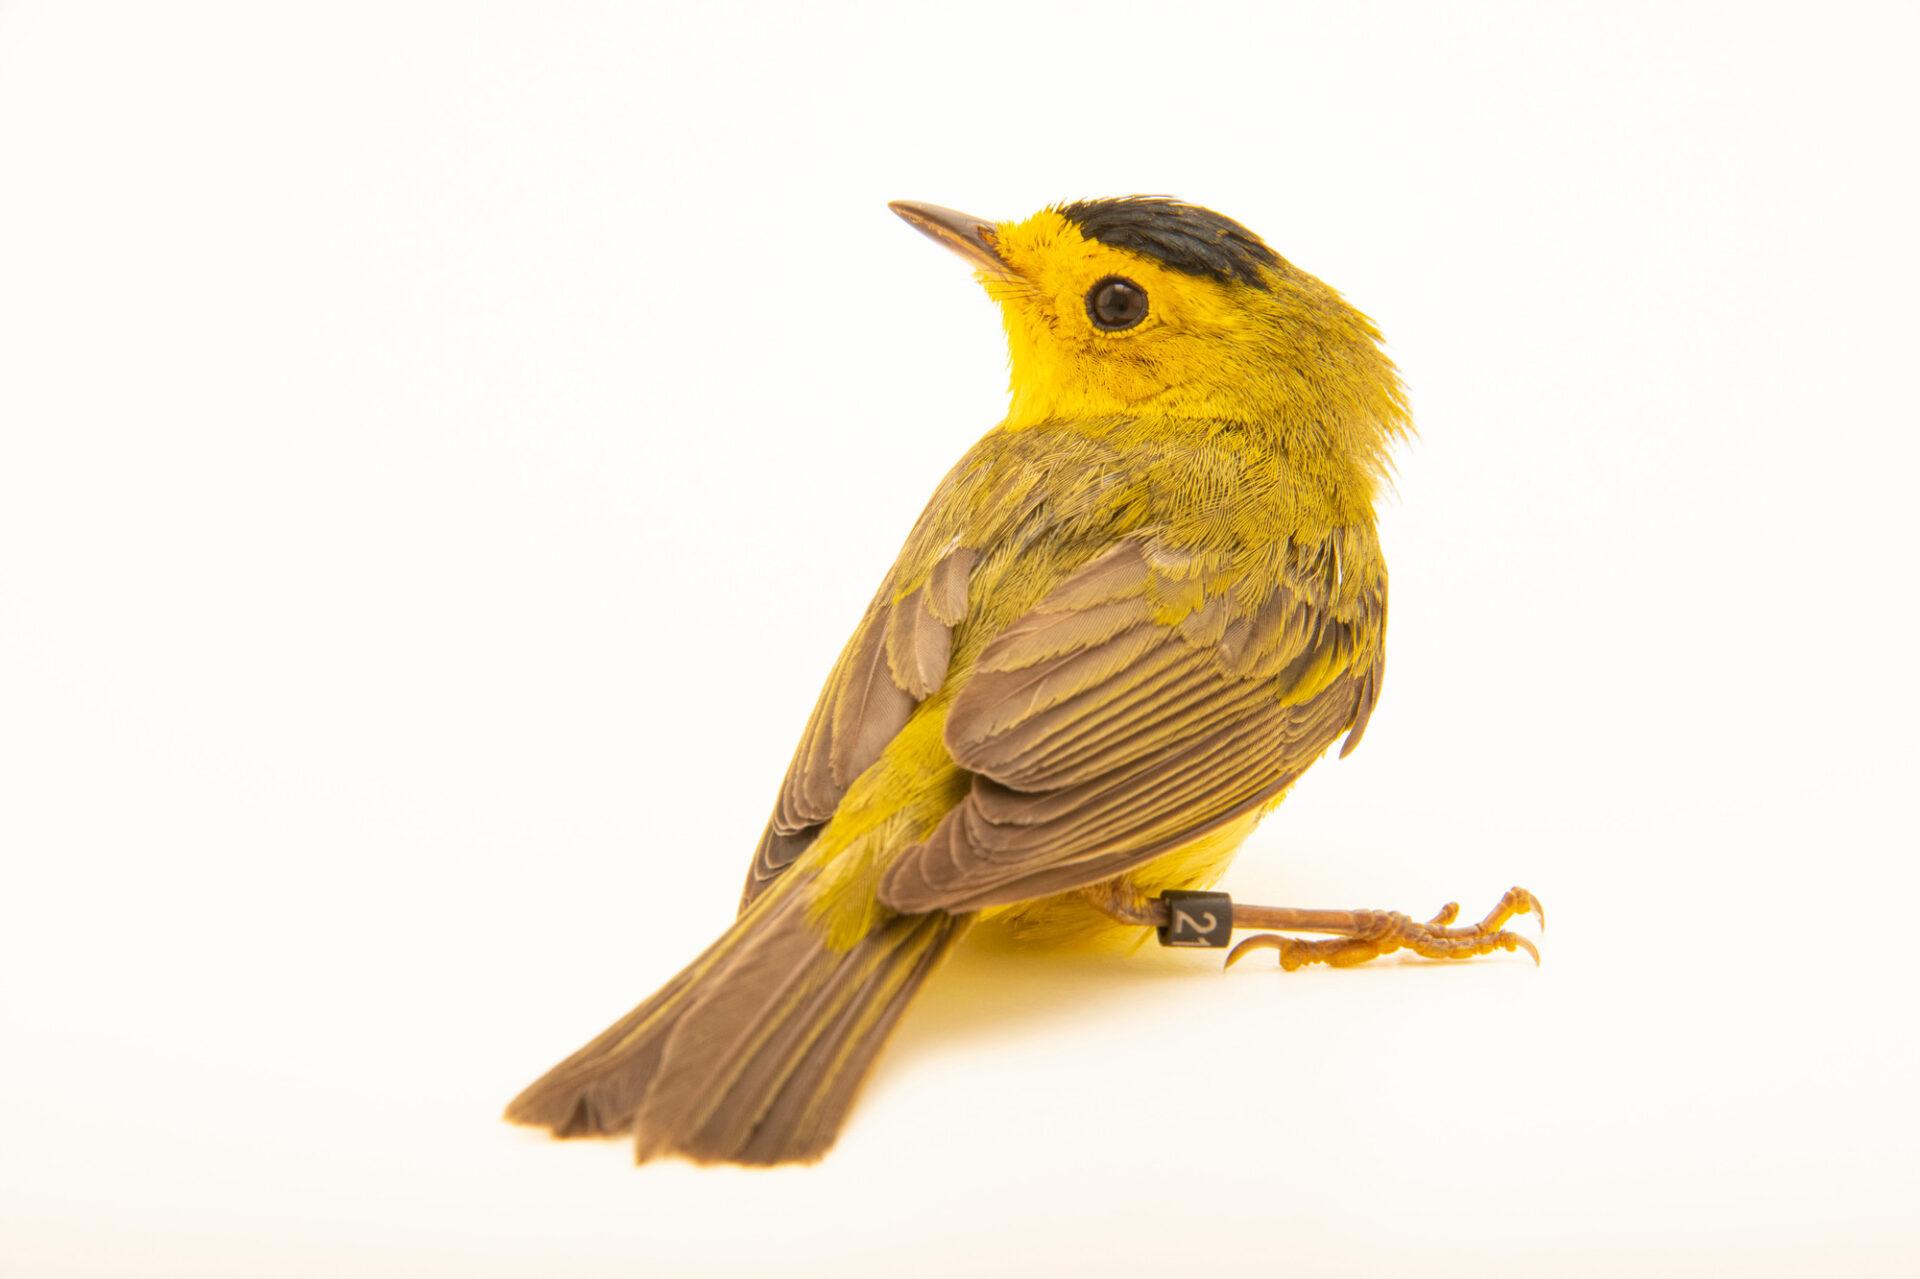 Photo: A Wilson's warbler (Cardellina pusilla) at the Wildlife Rehab Center of Minnesota.